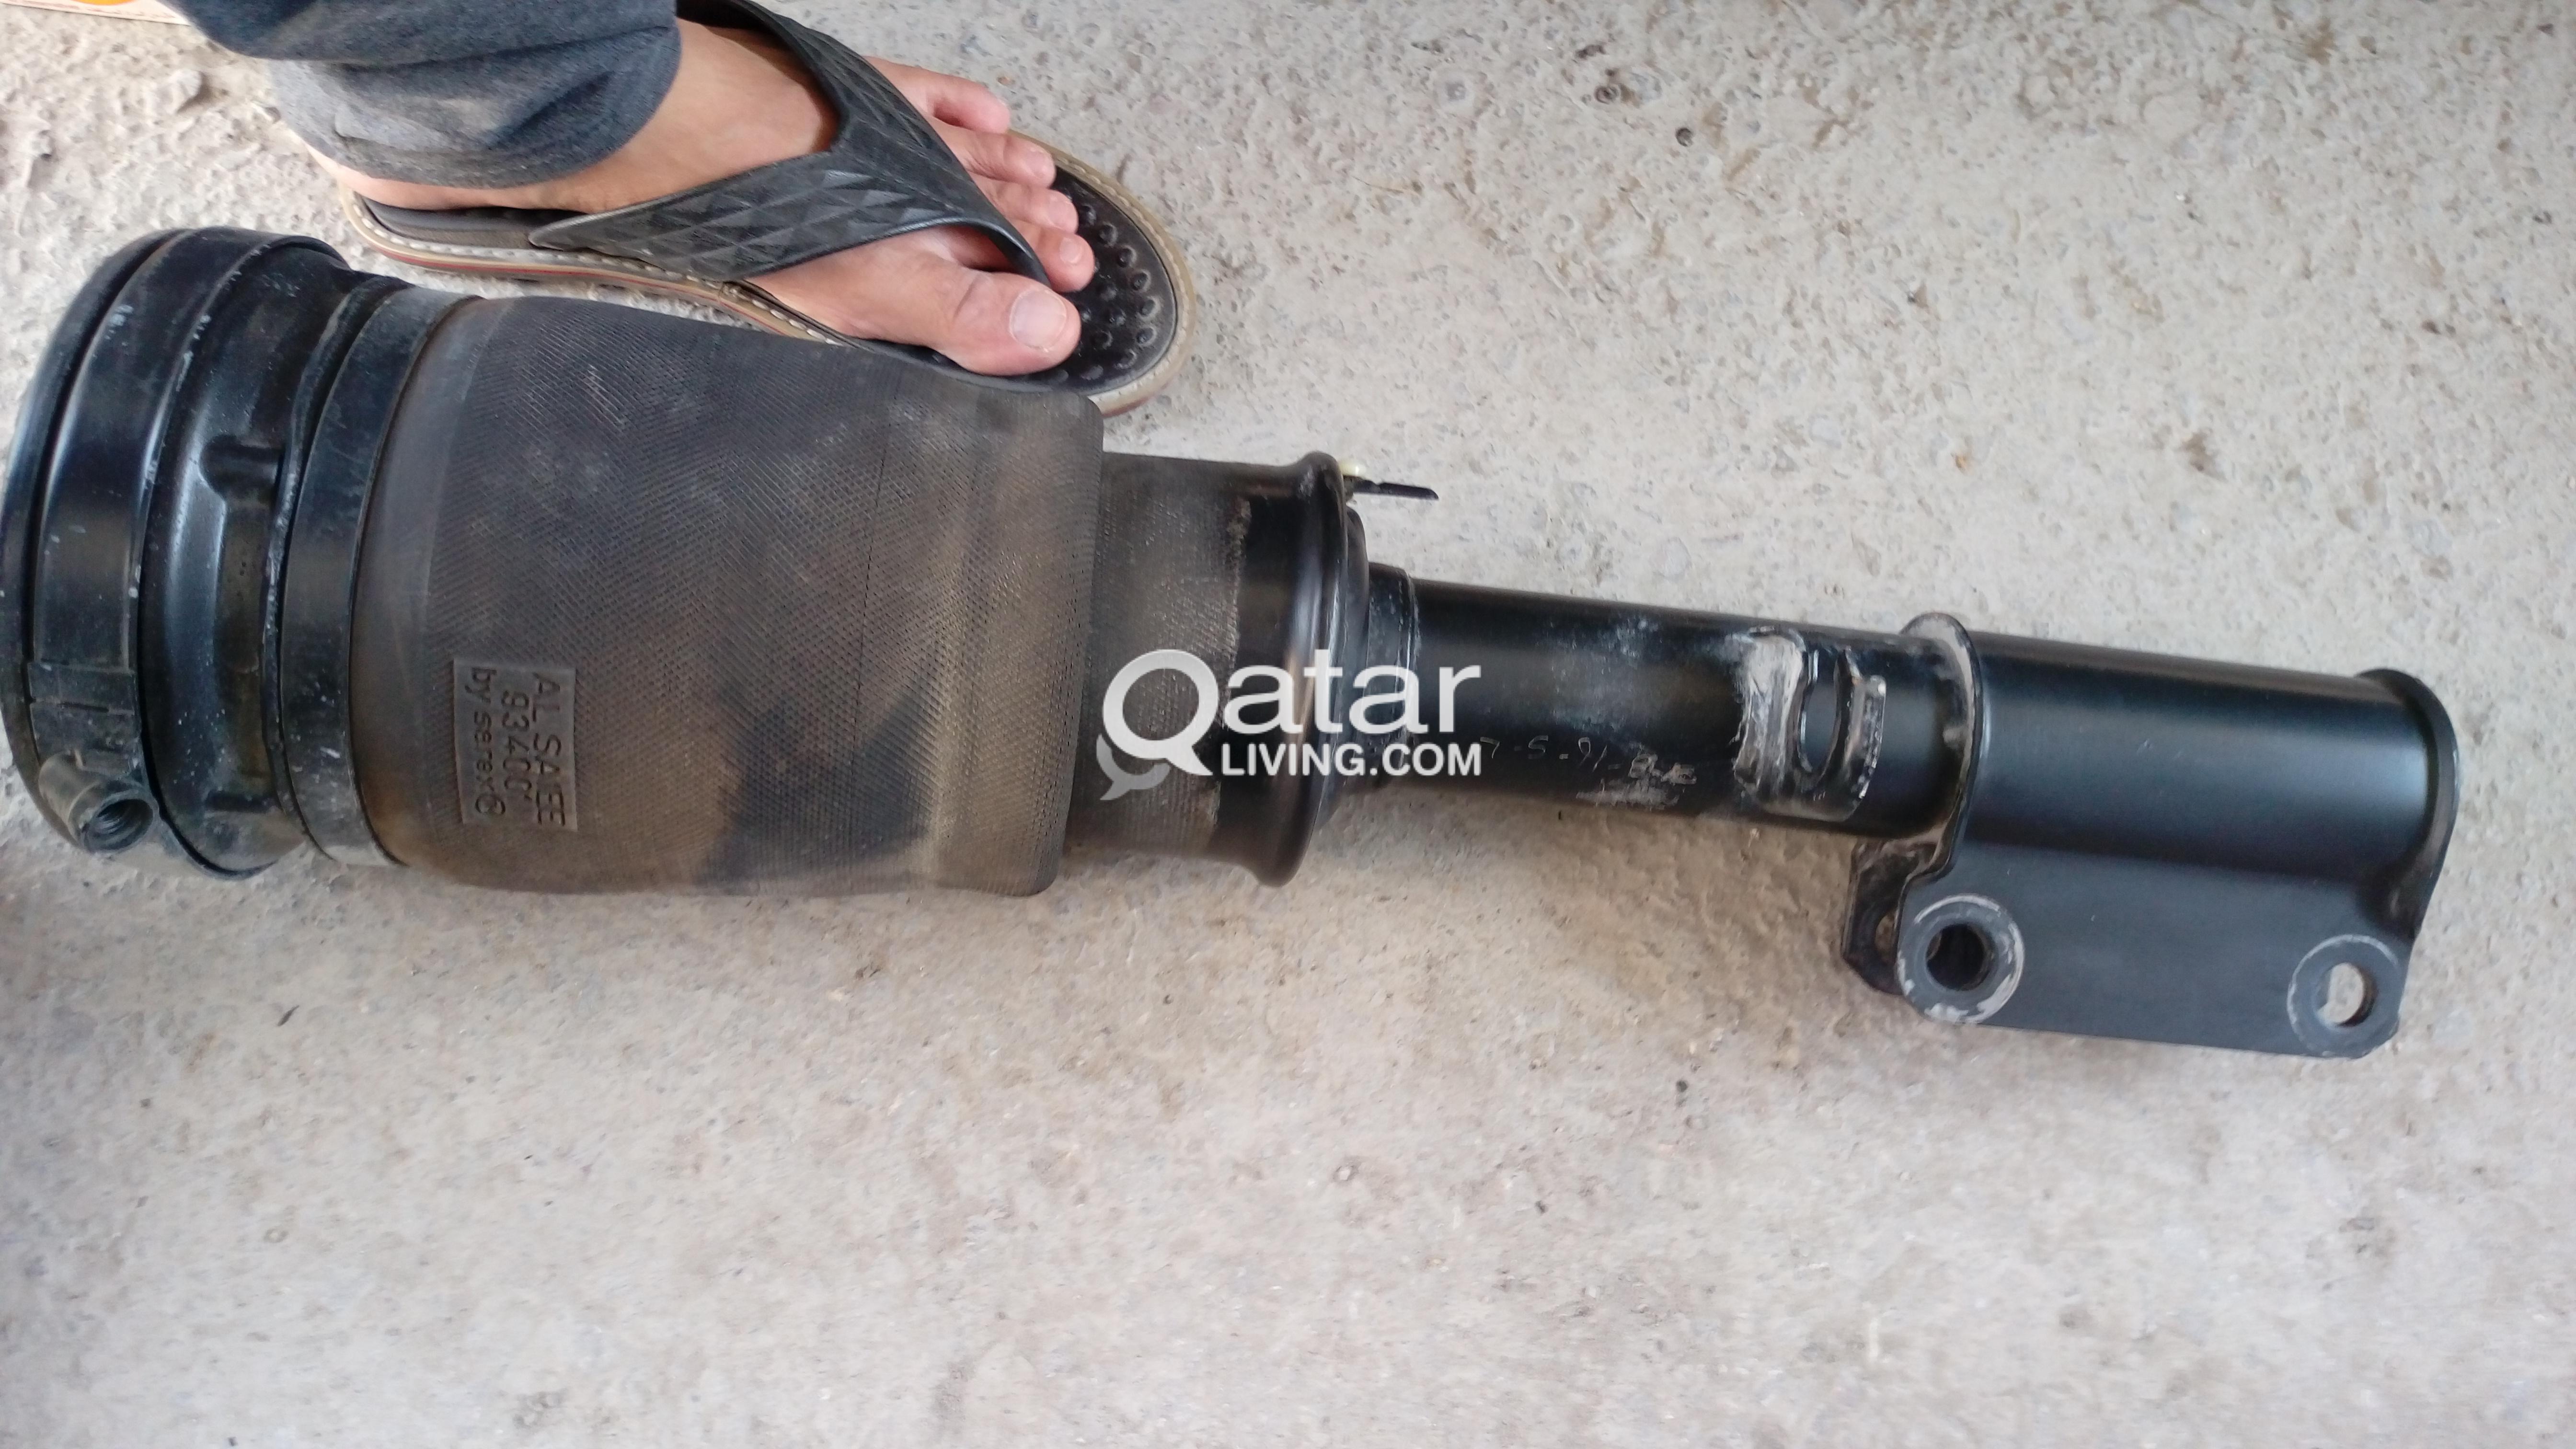 bmw x5 2005 air suspension left side for sale | Qatar Living